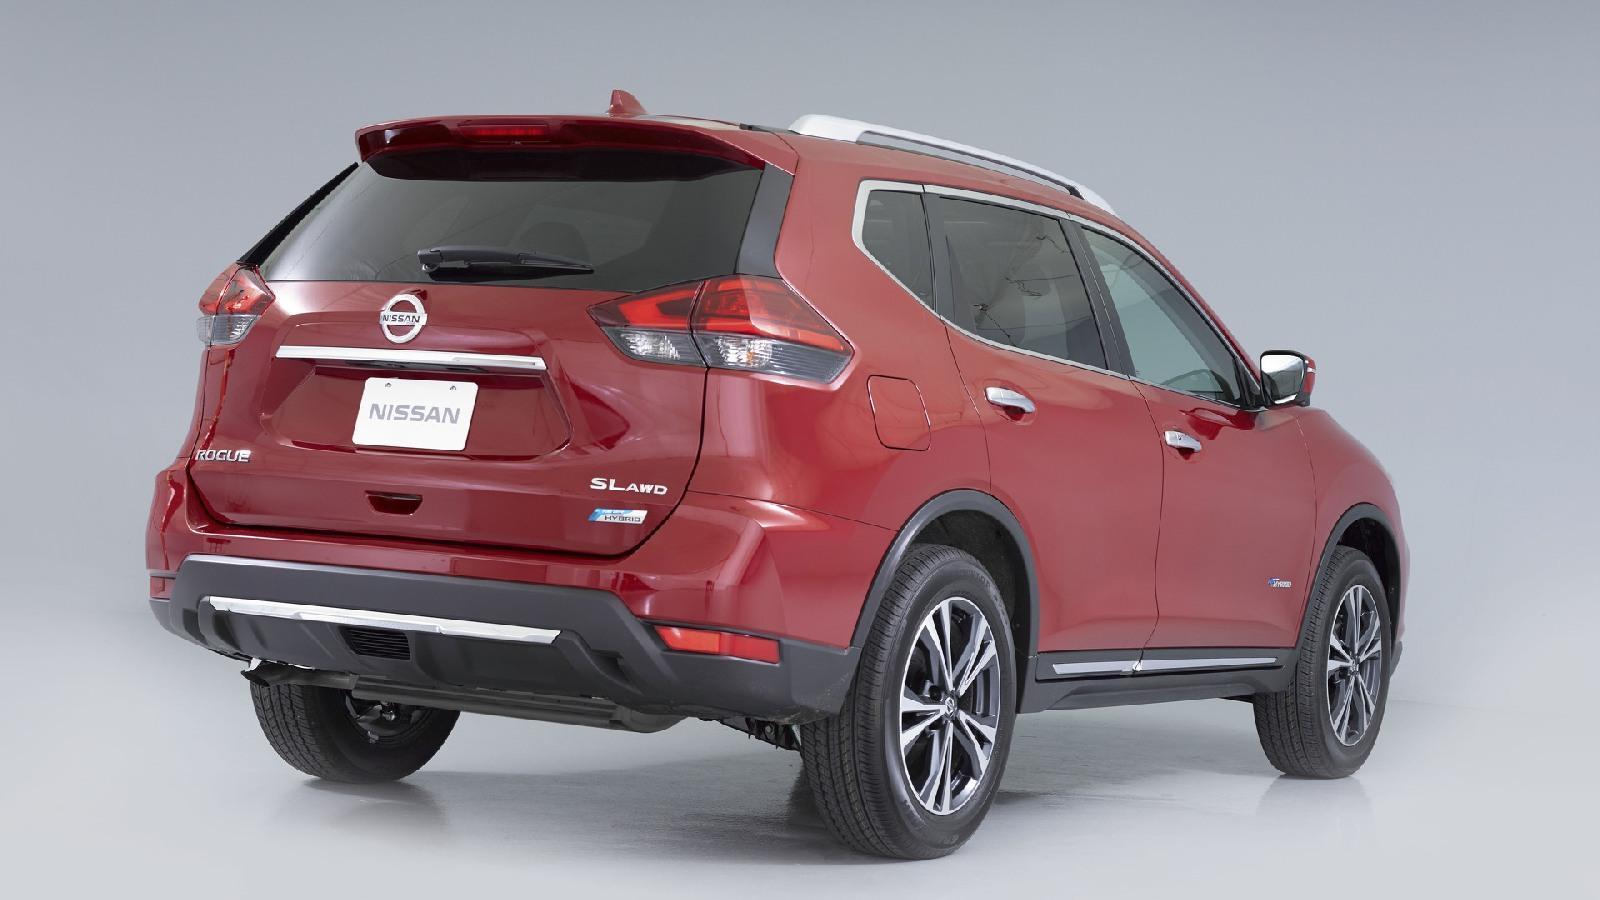 Nissan Rogue / X-Trail 2017